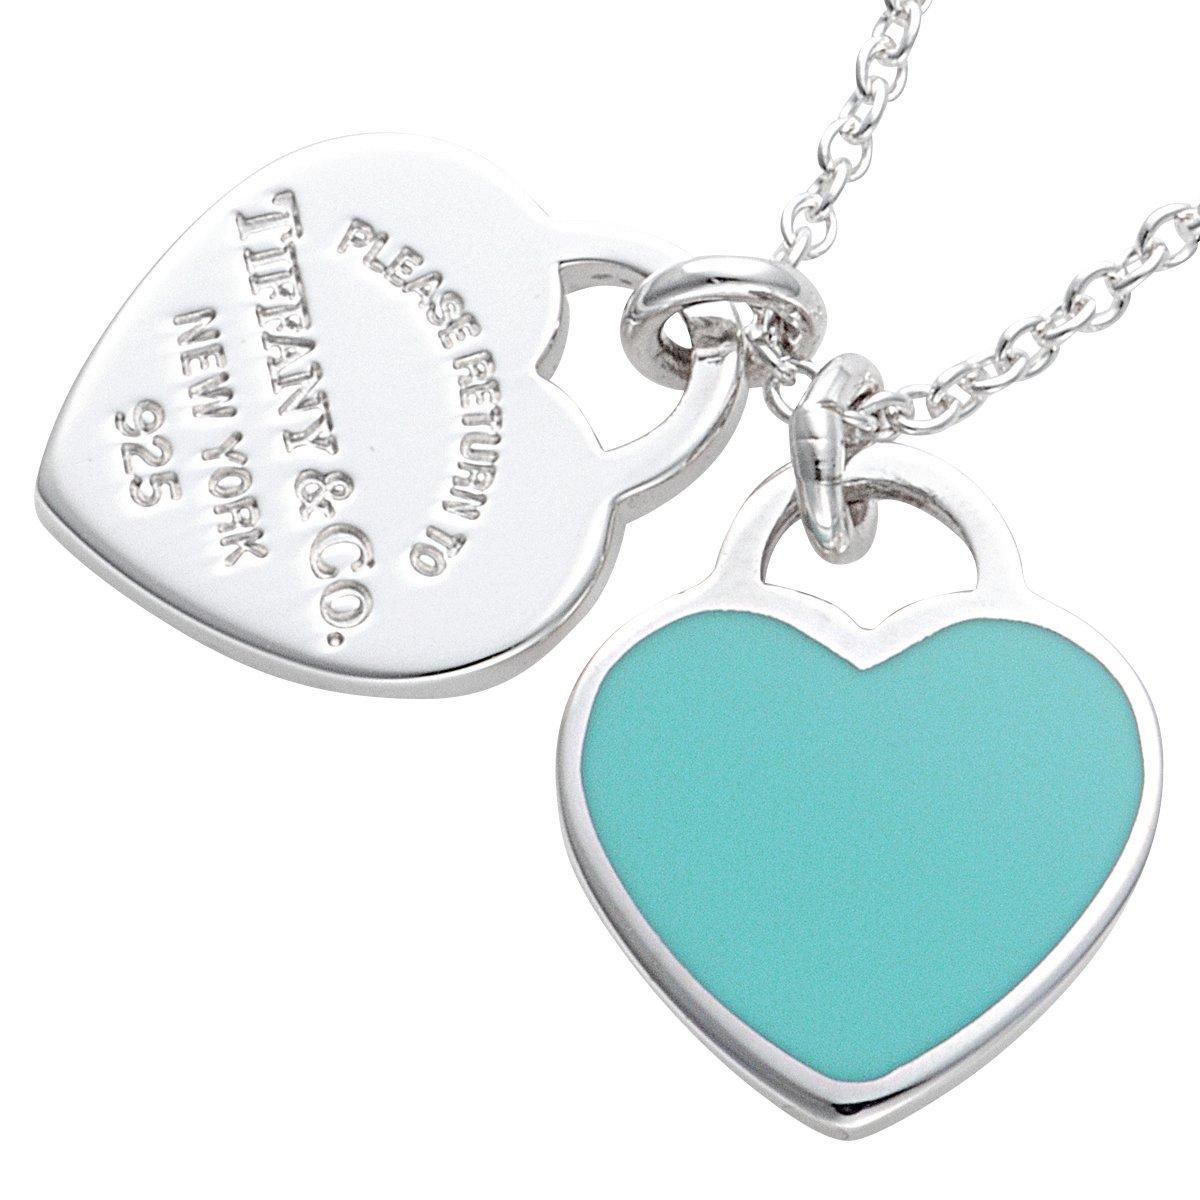 93cab4e86 Tiffany Sterling Silver/Blue Enamel Finish Rtt Double Heart Tag Pendant  Necklace 27125107: Amazon.co.uk: Jewellery